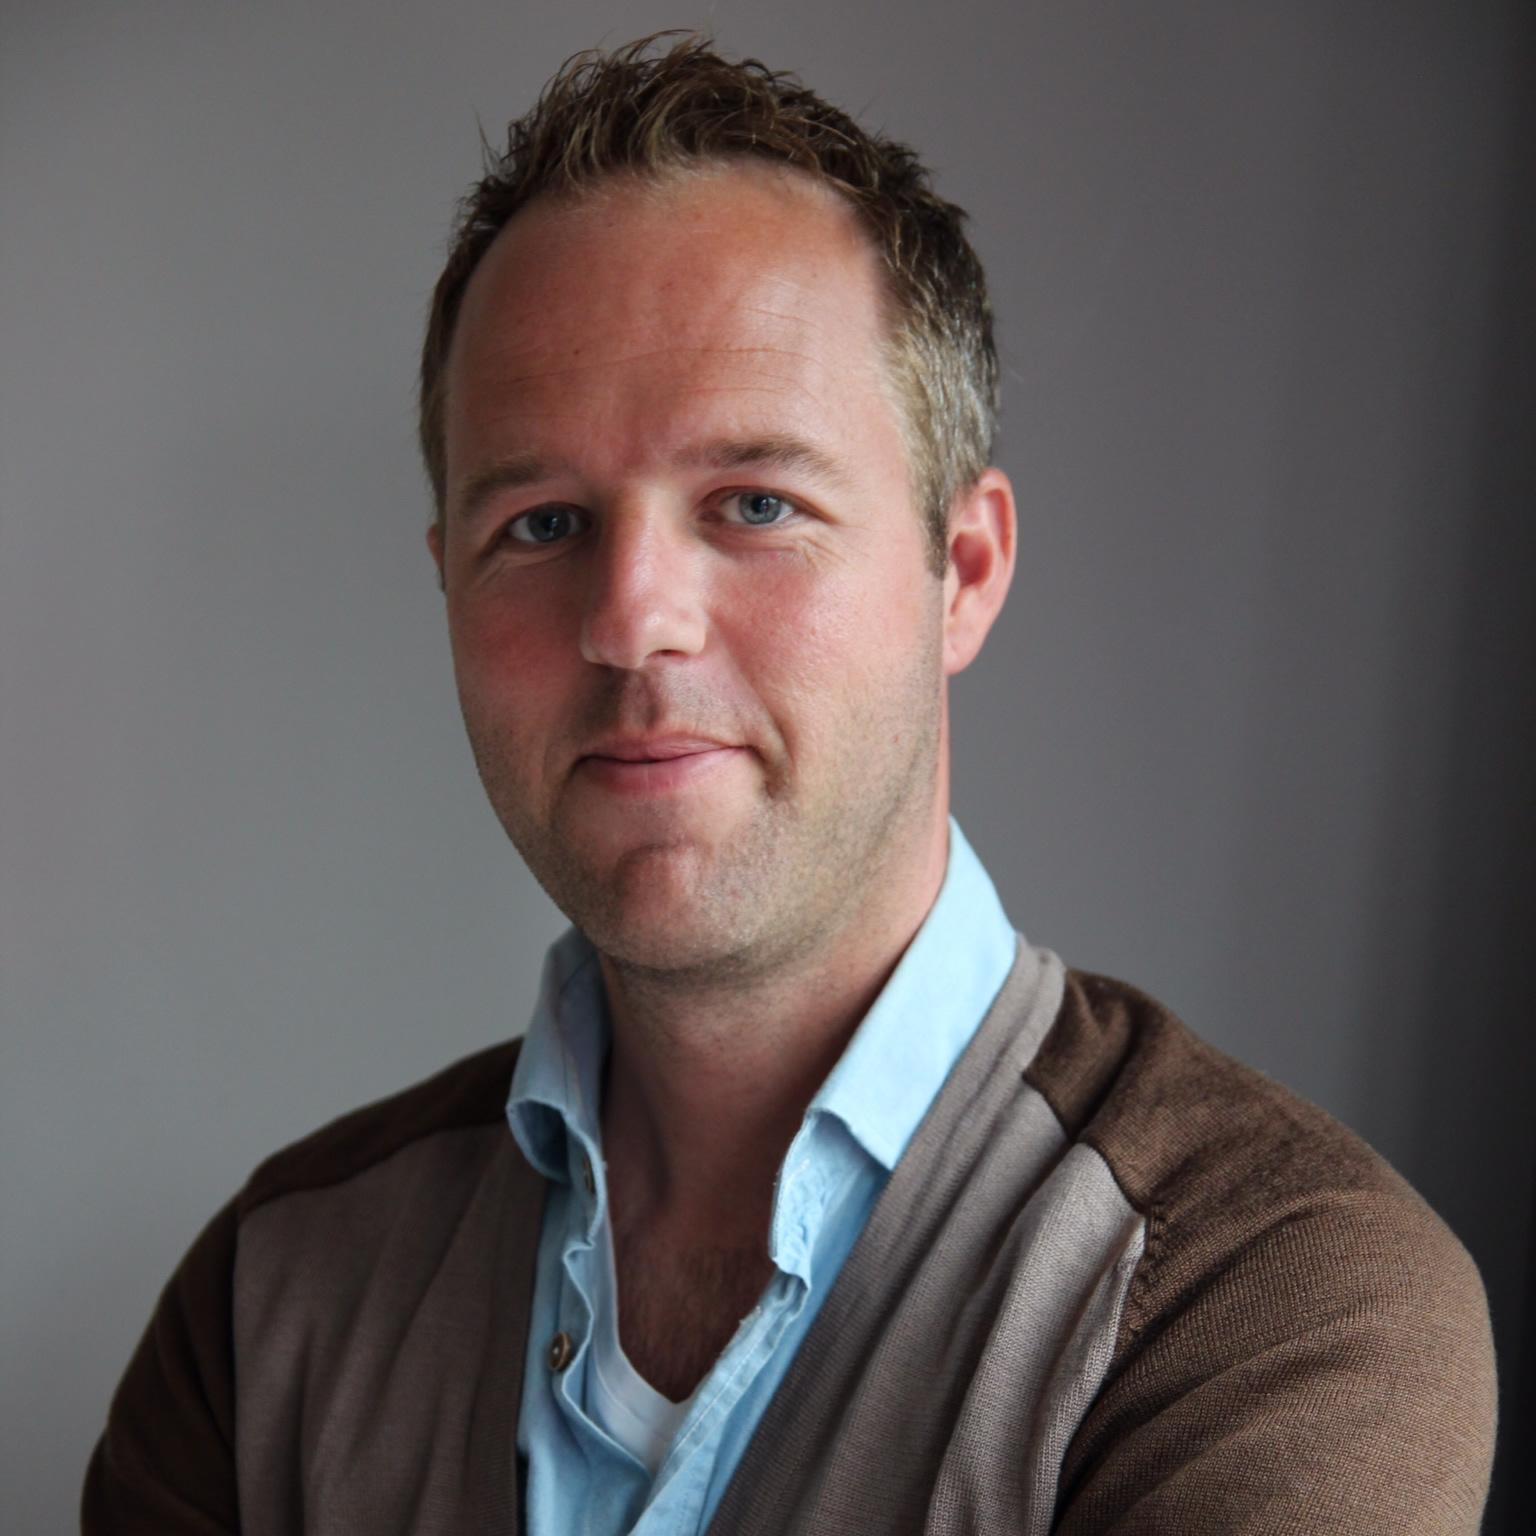 Robbie Veenendaal voorzitter van Fieldwork Foundation